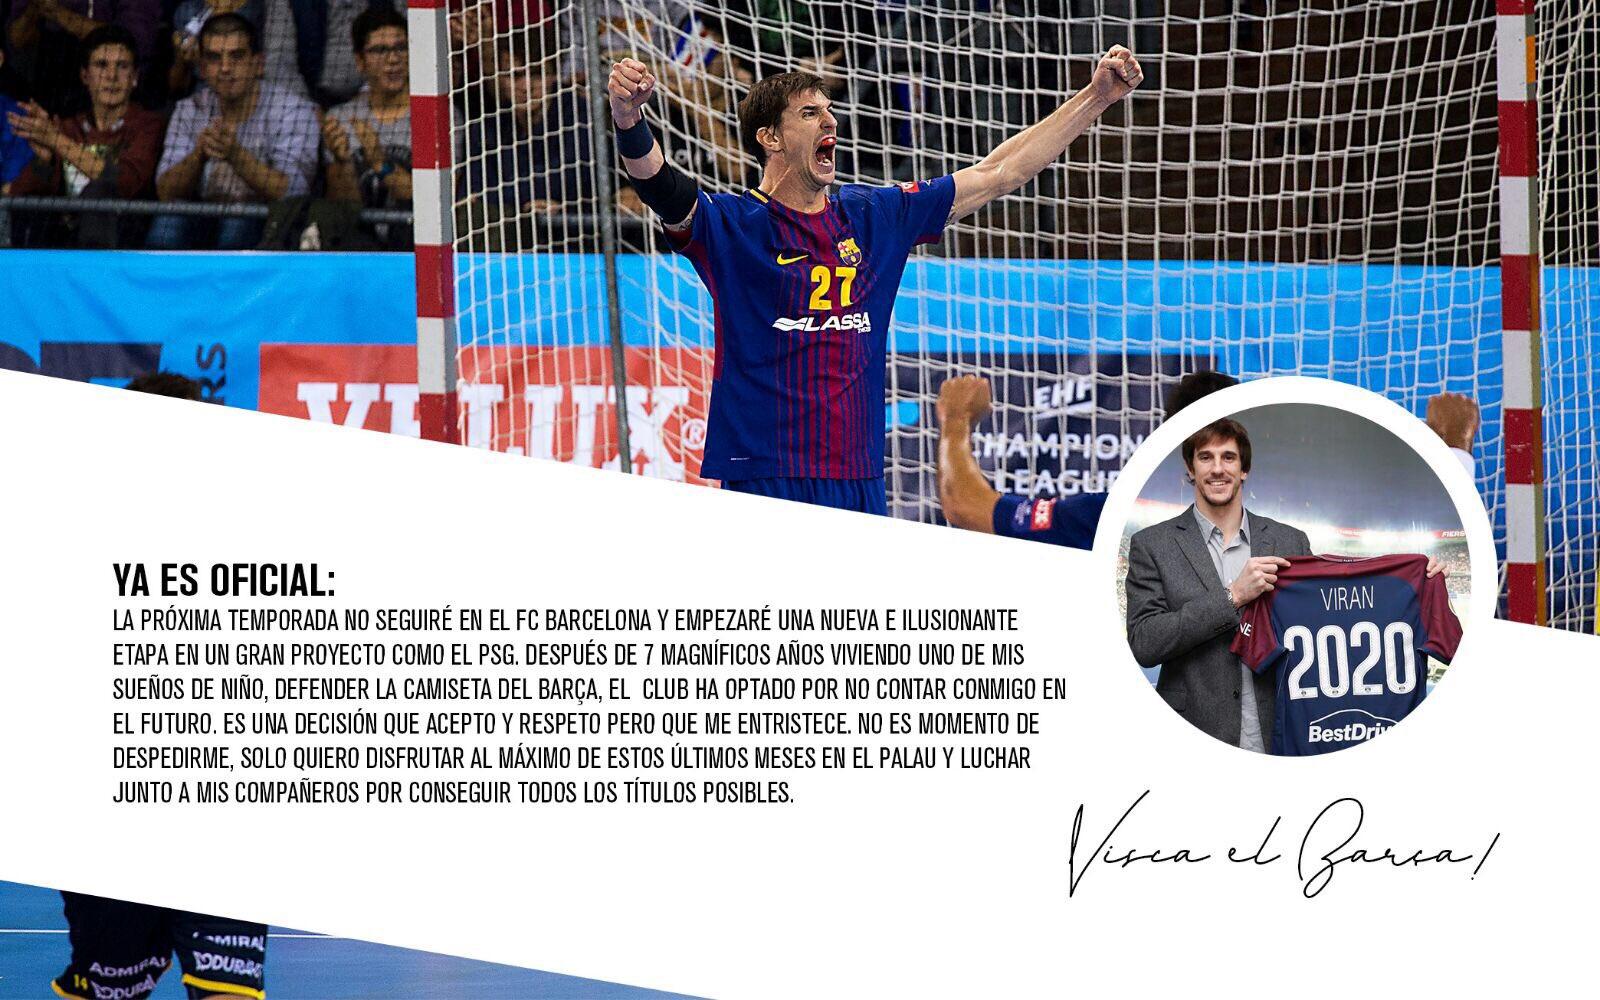 Viran Morros despedida Barcelona Lassa